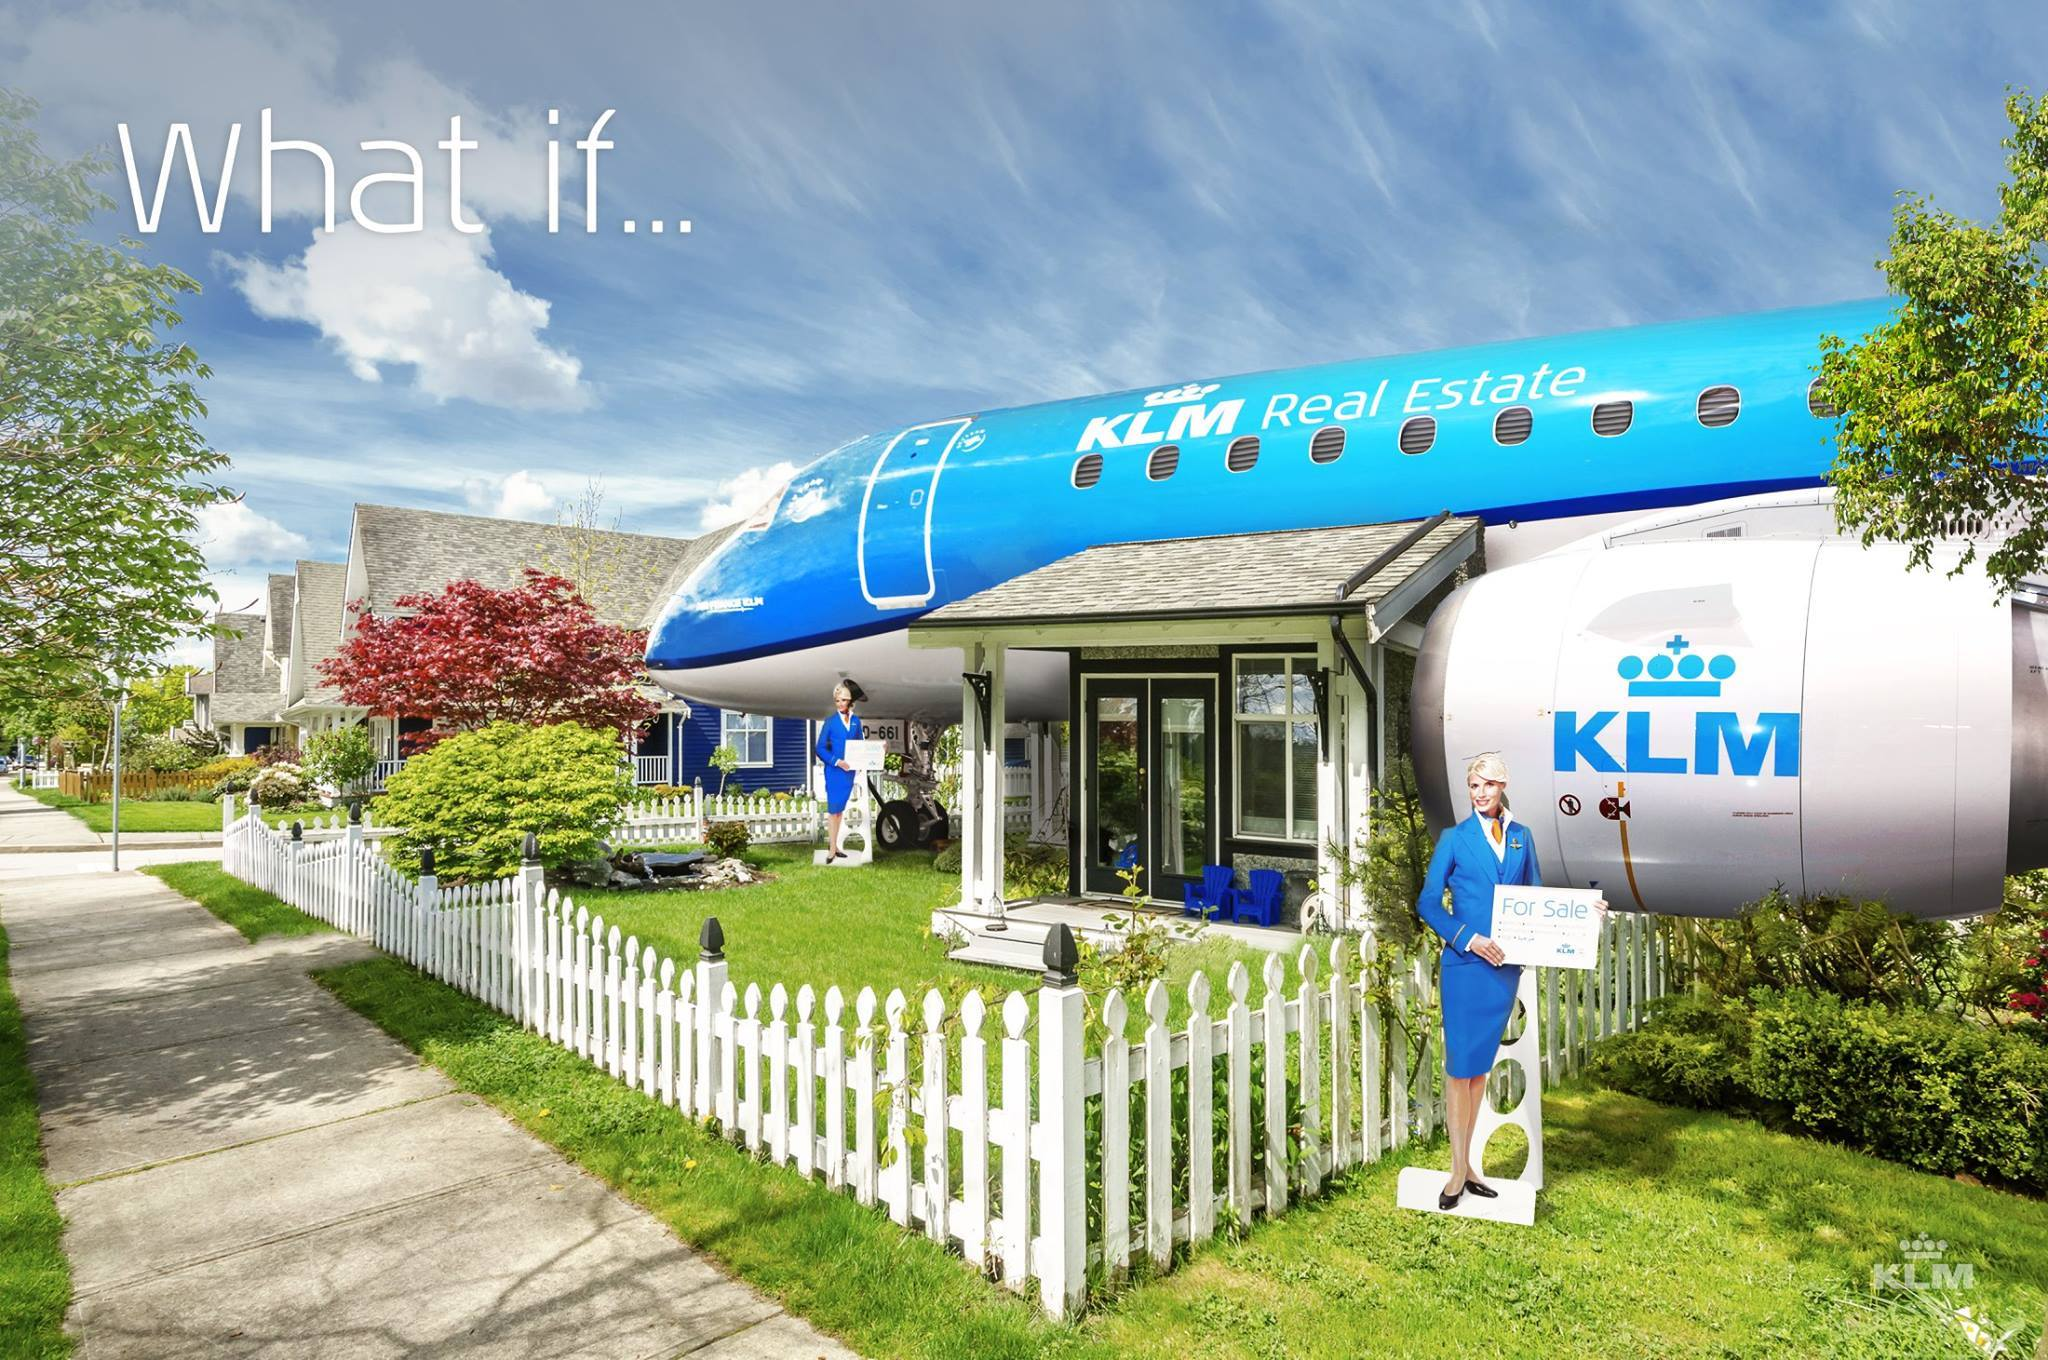 KLM Real Estate_ad_june 2014